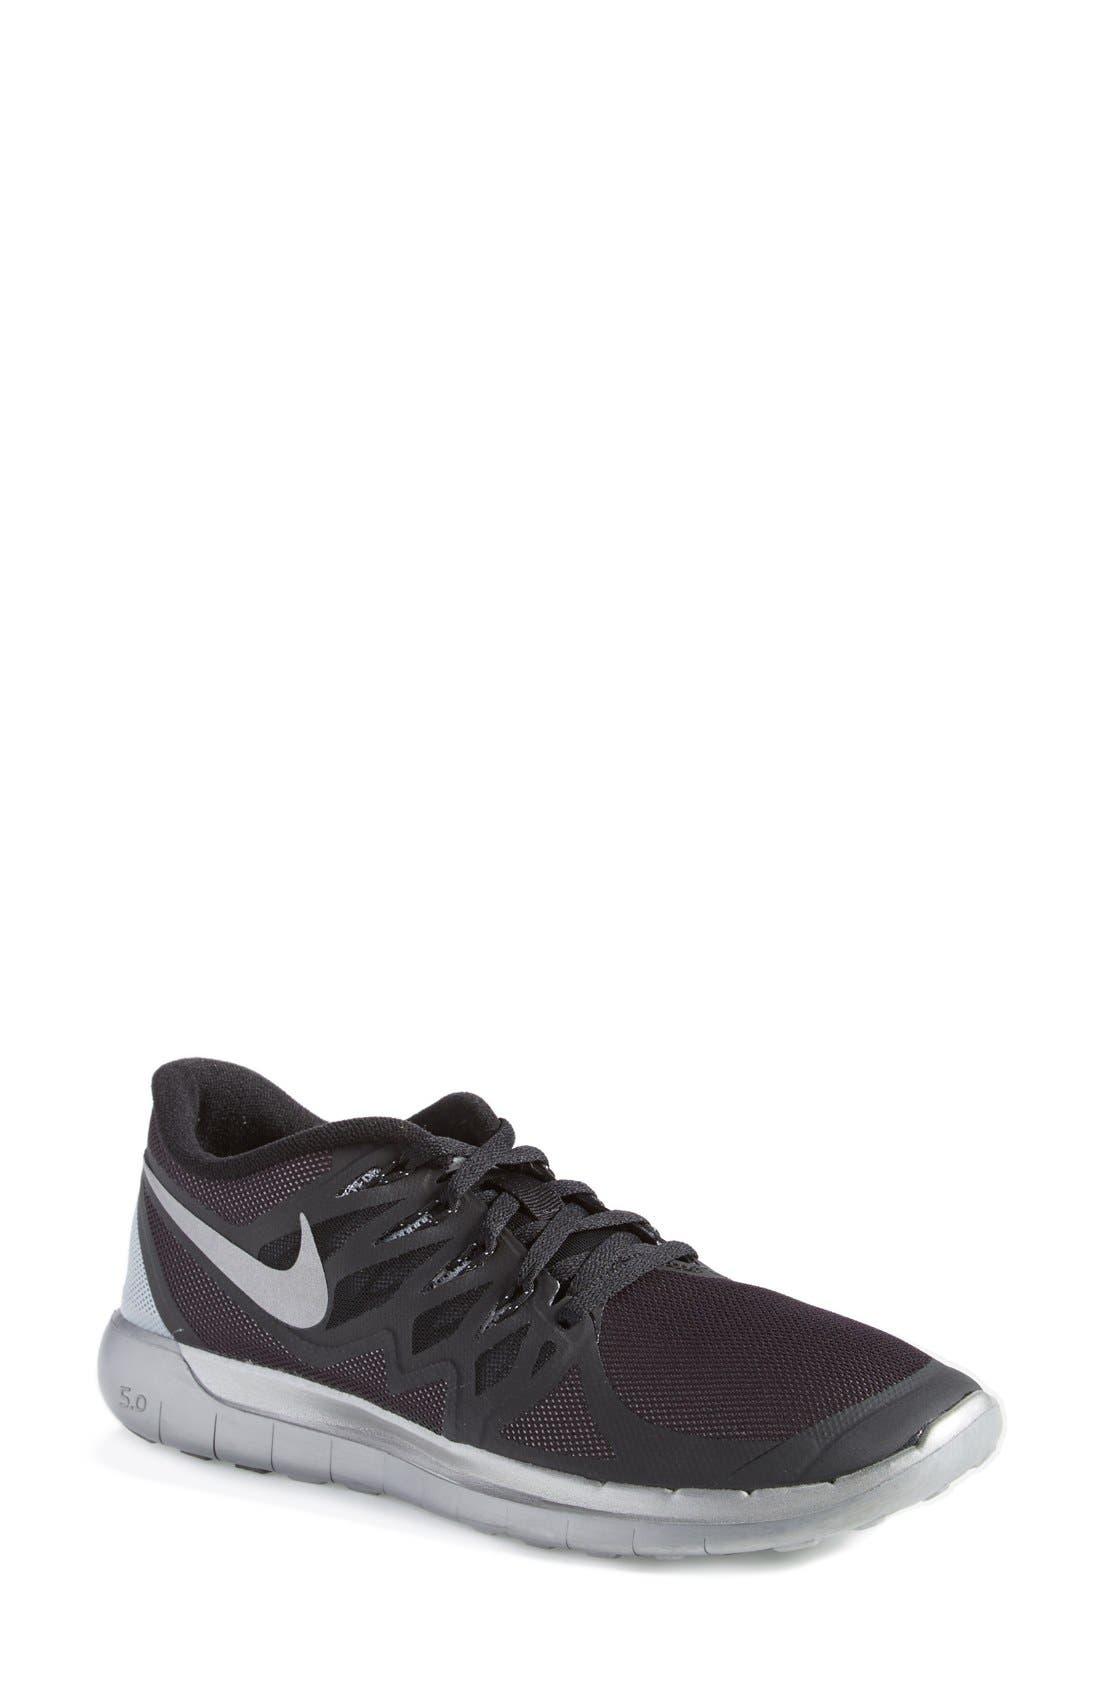 Main Image - Nike 'Free 5.0 Flash' Running Shoe (Women)